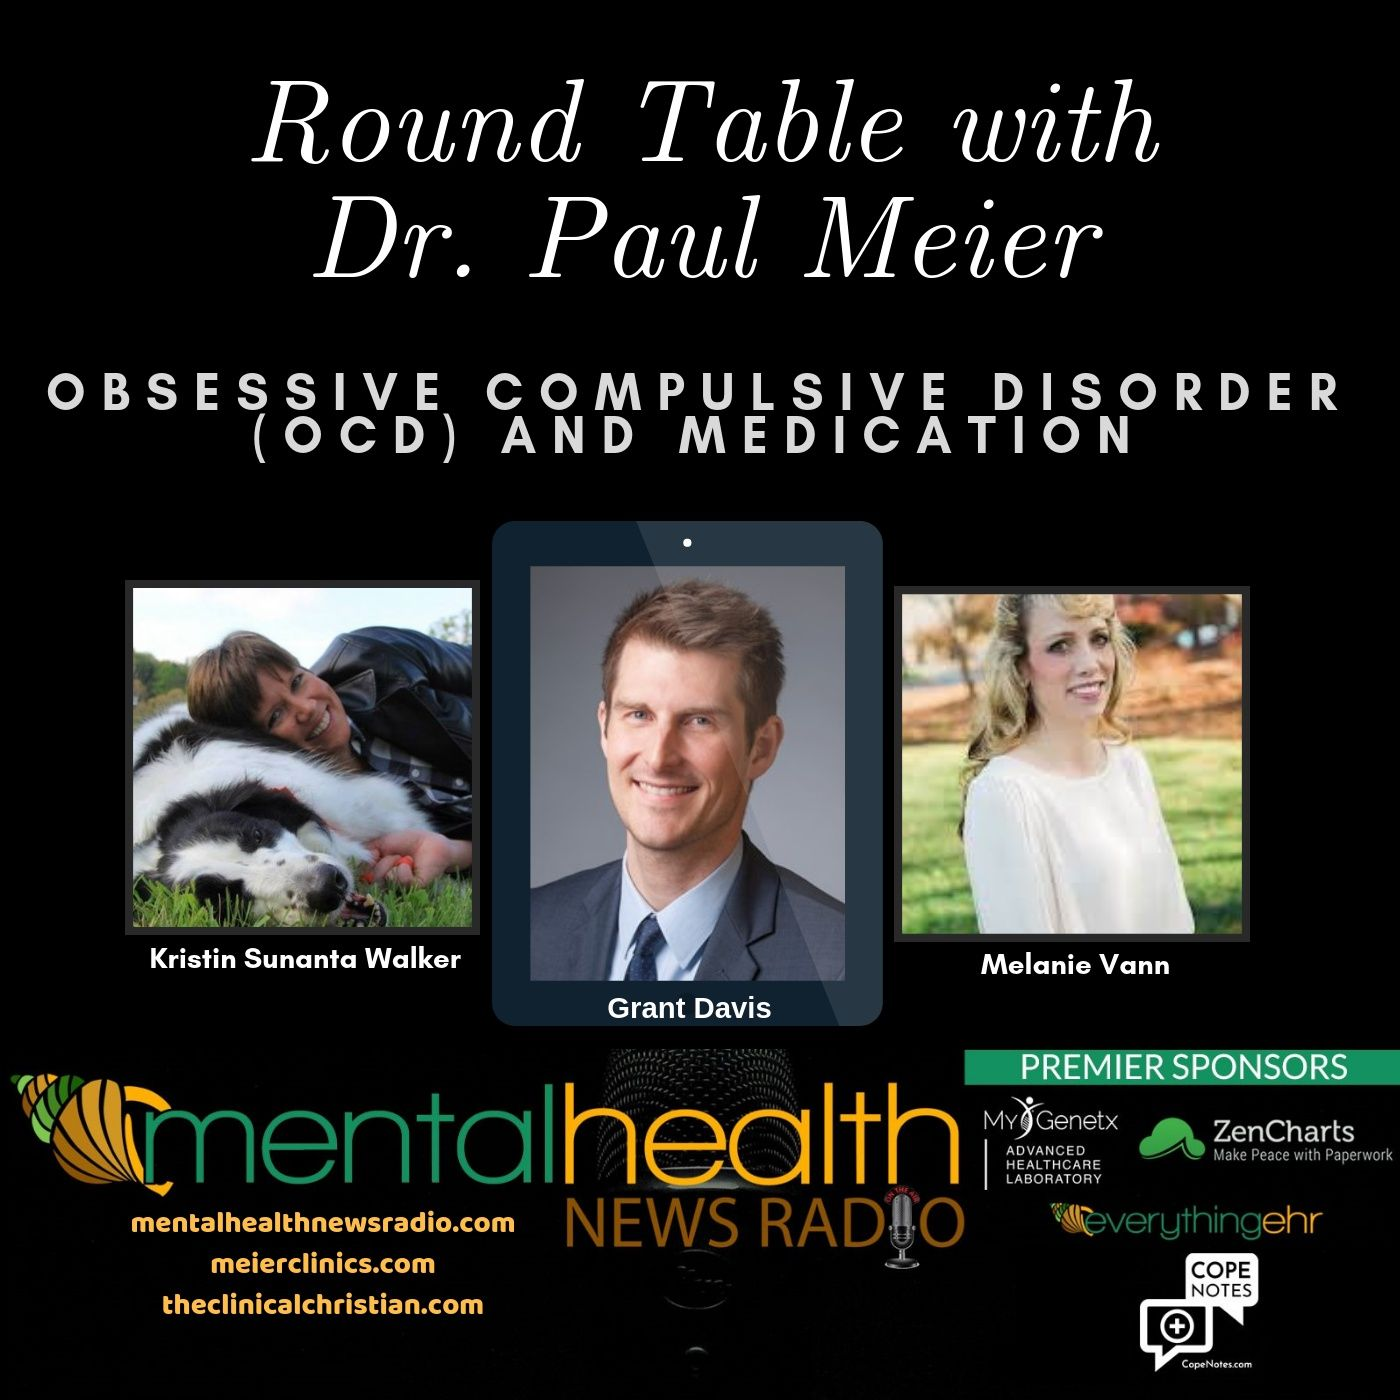 Mental Health News Radio - Round Table with Dr. Paul Meier: OCD Medication